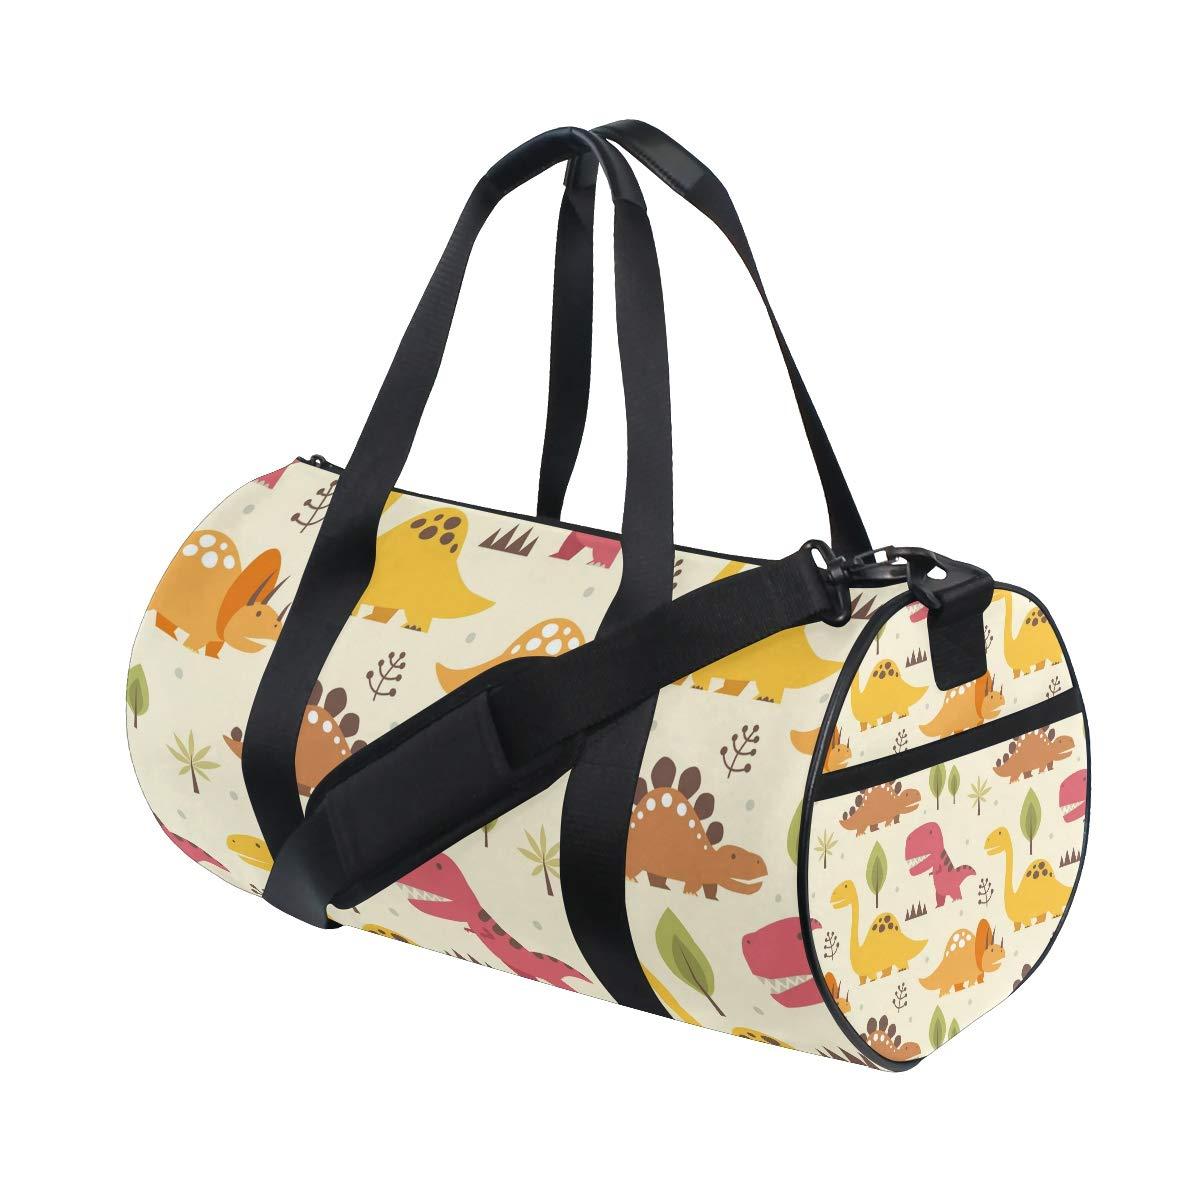 Various Of Cartoon Dinasours Women Sports Gym Totes Bag Multi-Function Nylon Travel Shoulder Bag